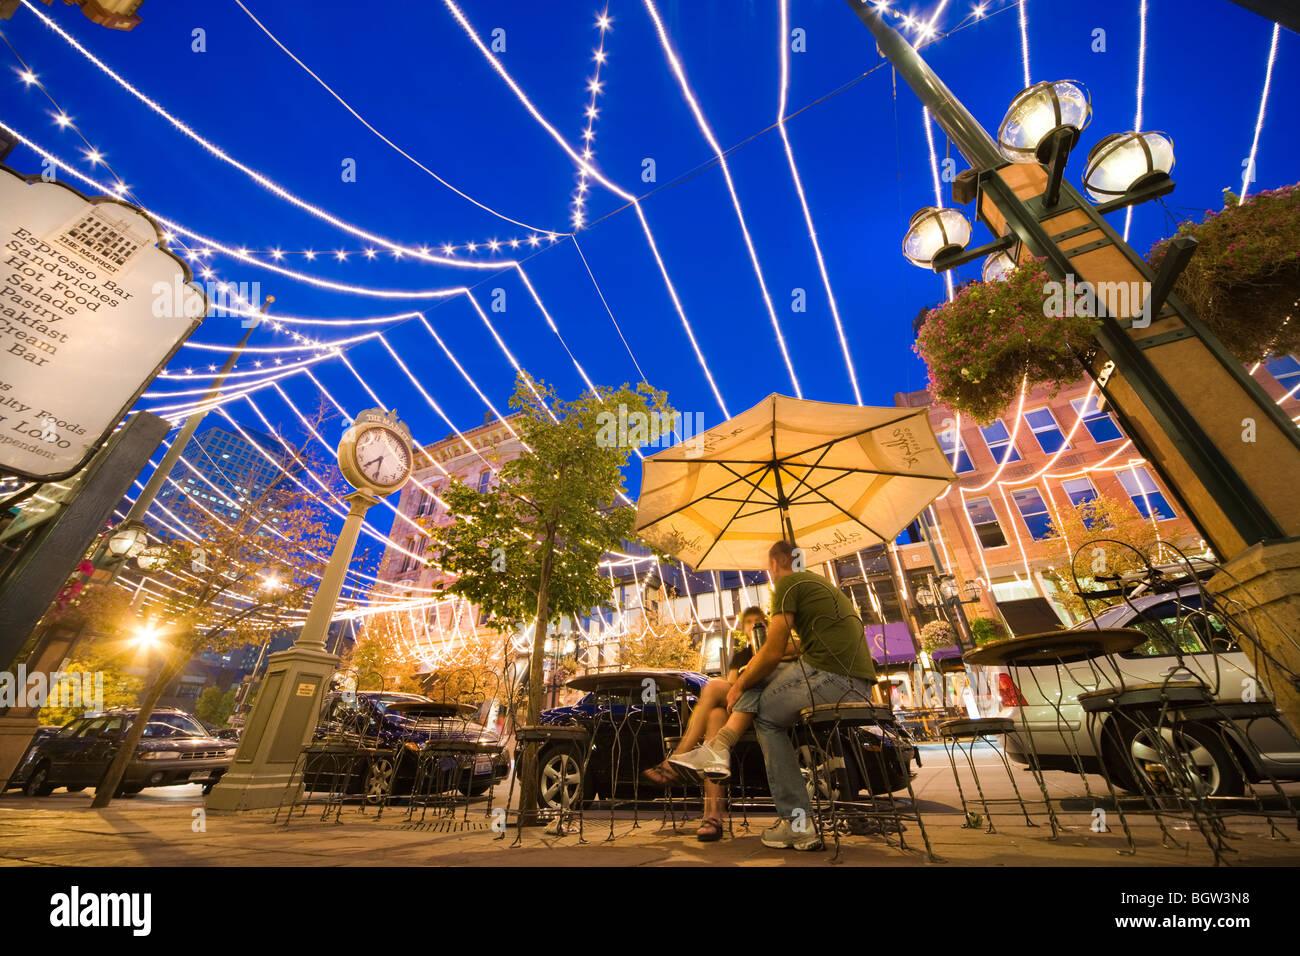 LoDo Denver supermercado Deli restaurante café al mercado Larimer Square, calle al atardecer. Imagen De Stock